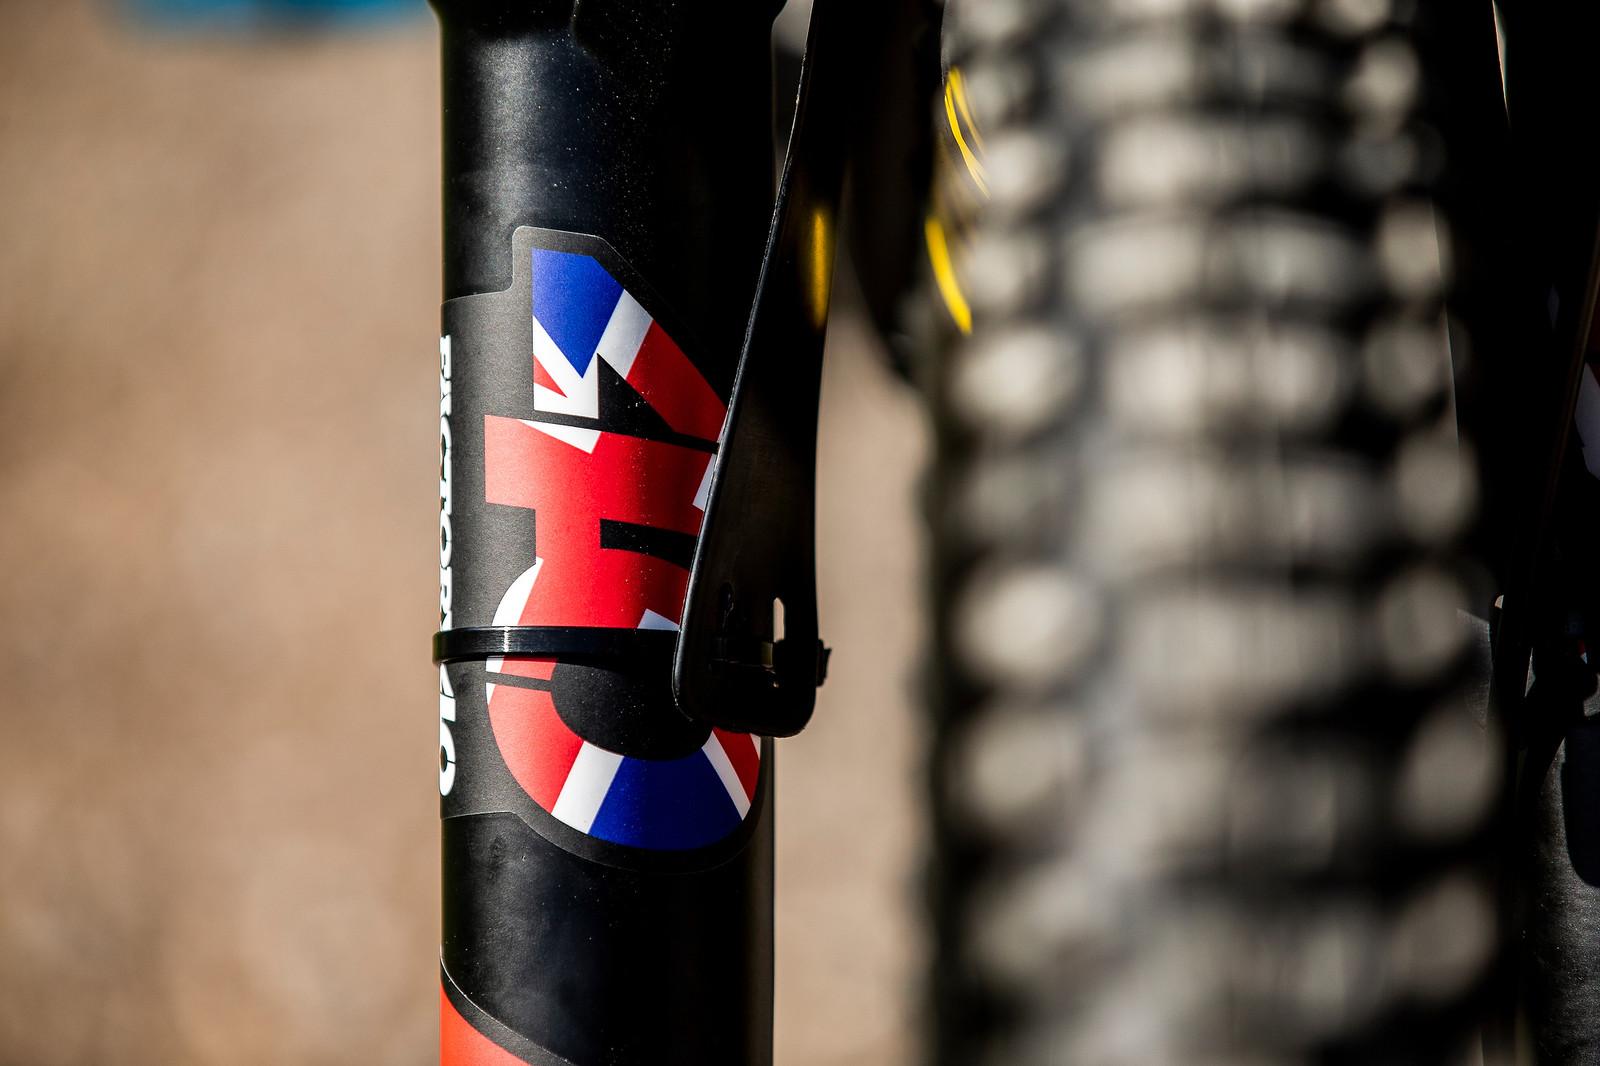 Details - WORLD CHAMPS BIKE - Danny Hart's Saracen Myst - Mountain Biking Pictures - Vital MTB